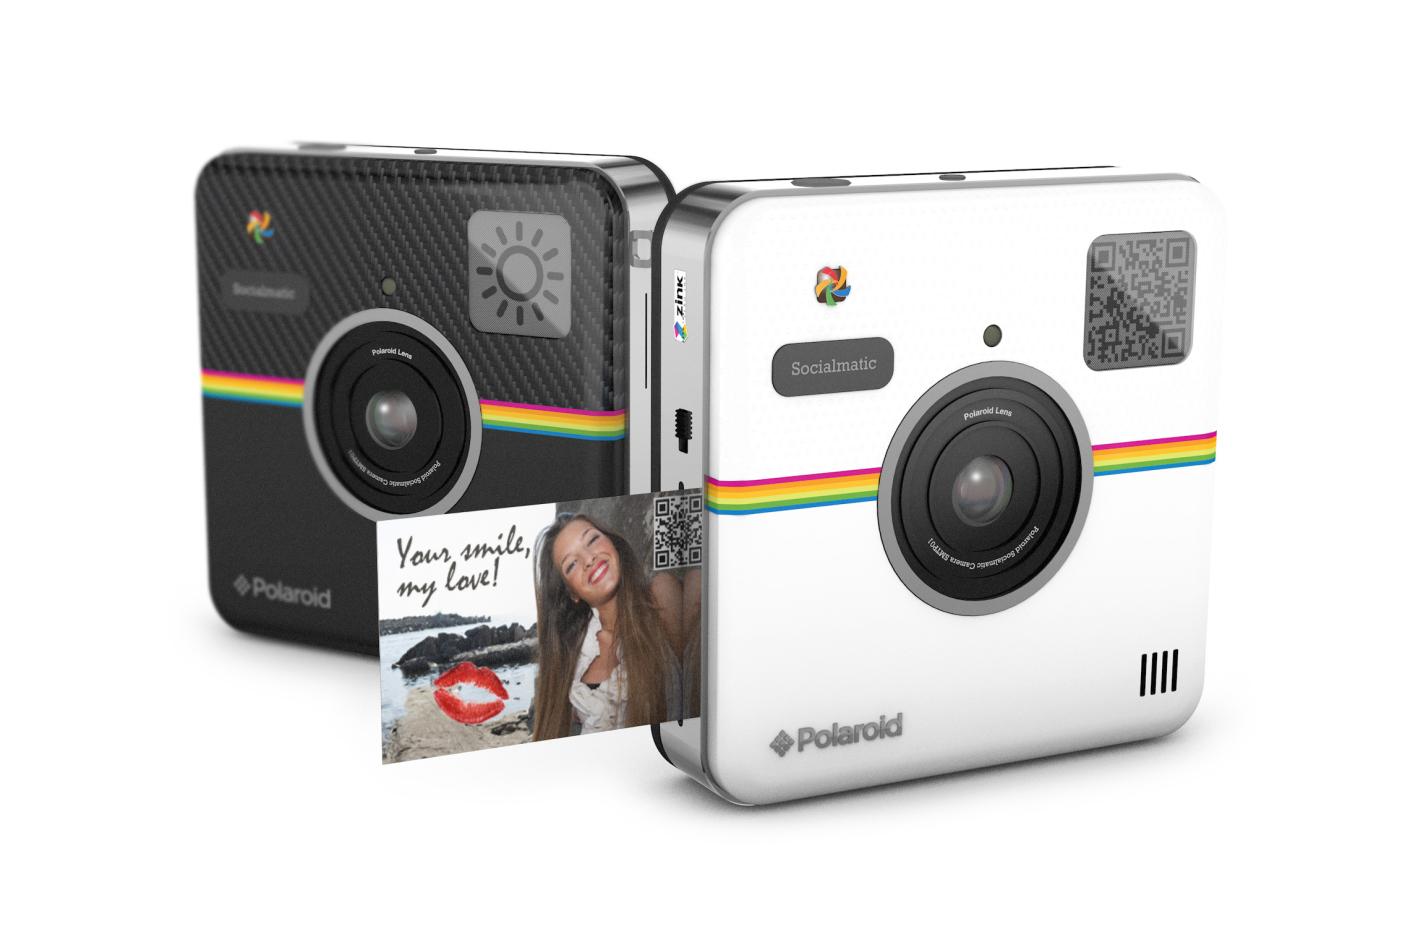 wellbots-polaroid-socialmatic-banner